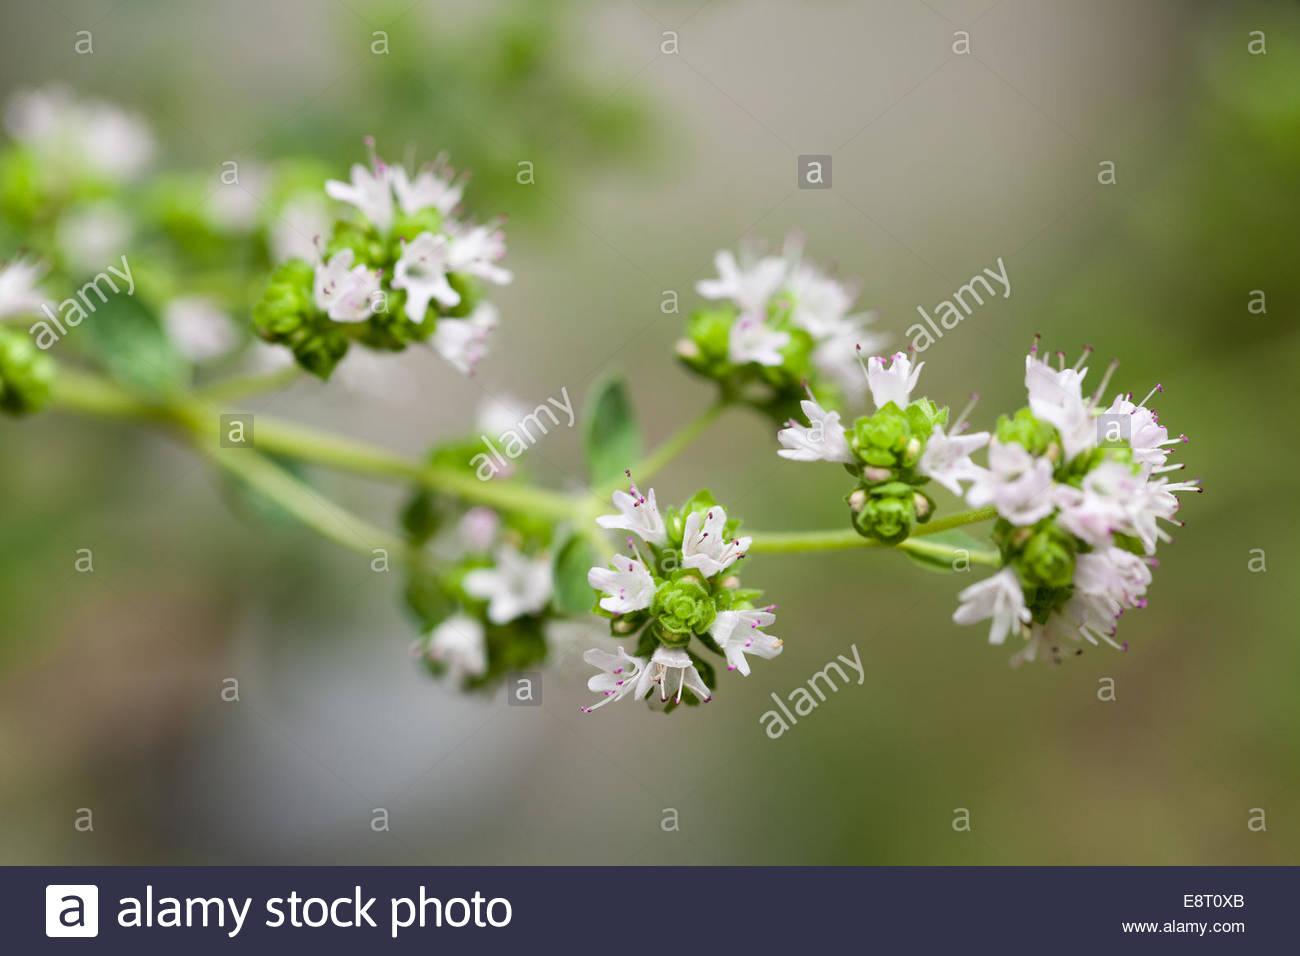 Fresh white flowers on an oregano plant stock photo 74286307 alamy fresh white flowers on an oregano plant mightylinksfo